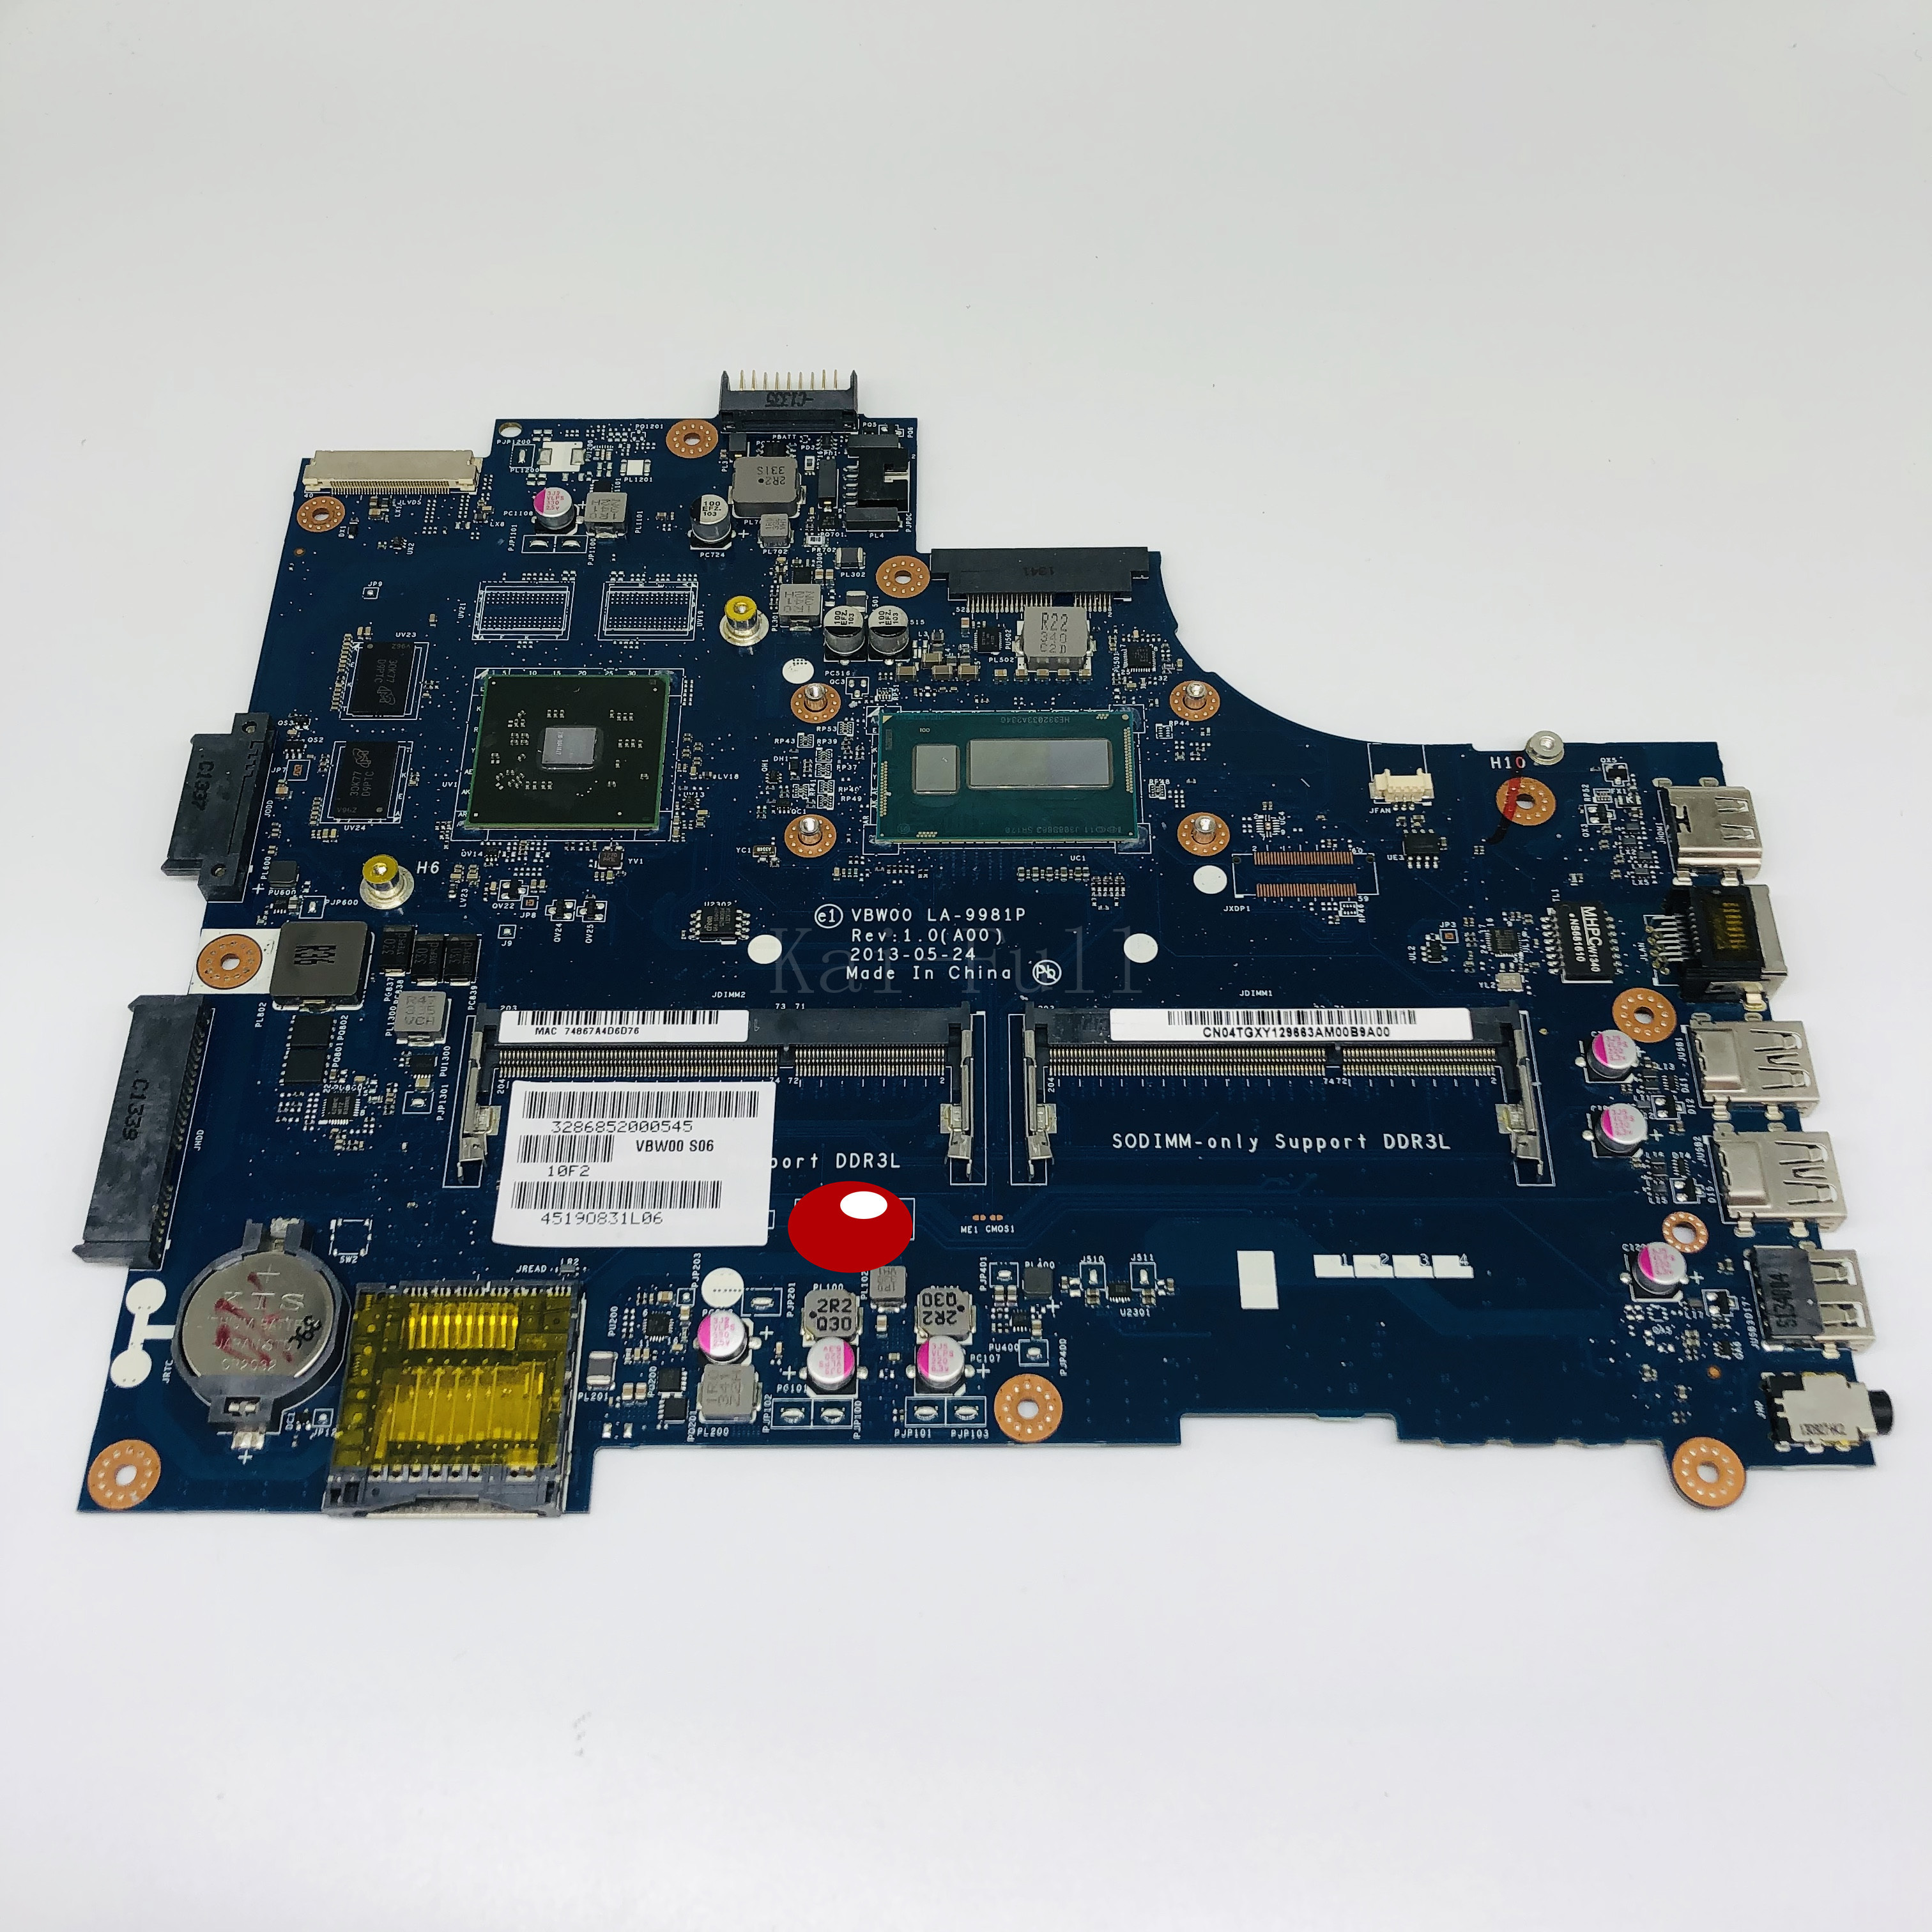 VBW00 LA-9981P ноутбук материнская плата для Dell Inspiron 15R 3537 5537 Тесты оригинальная материнская плата I7-4500U AMD HD 8670 м